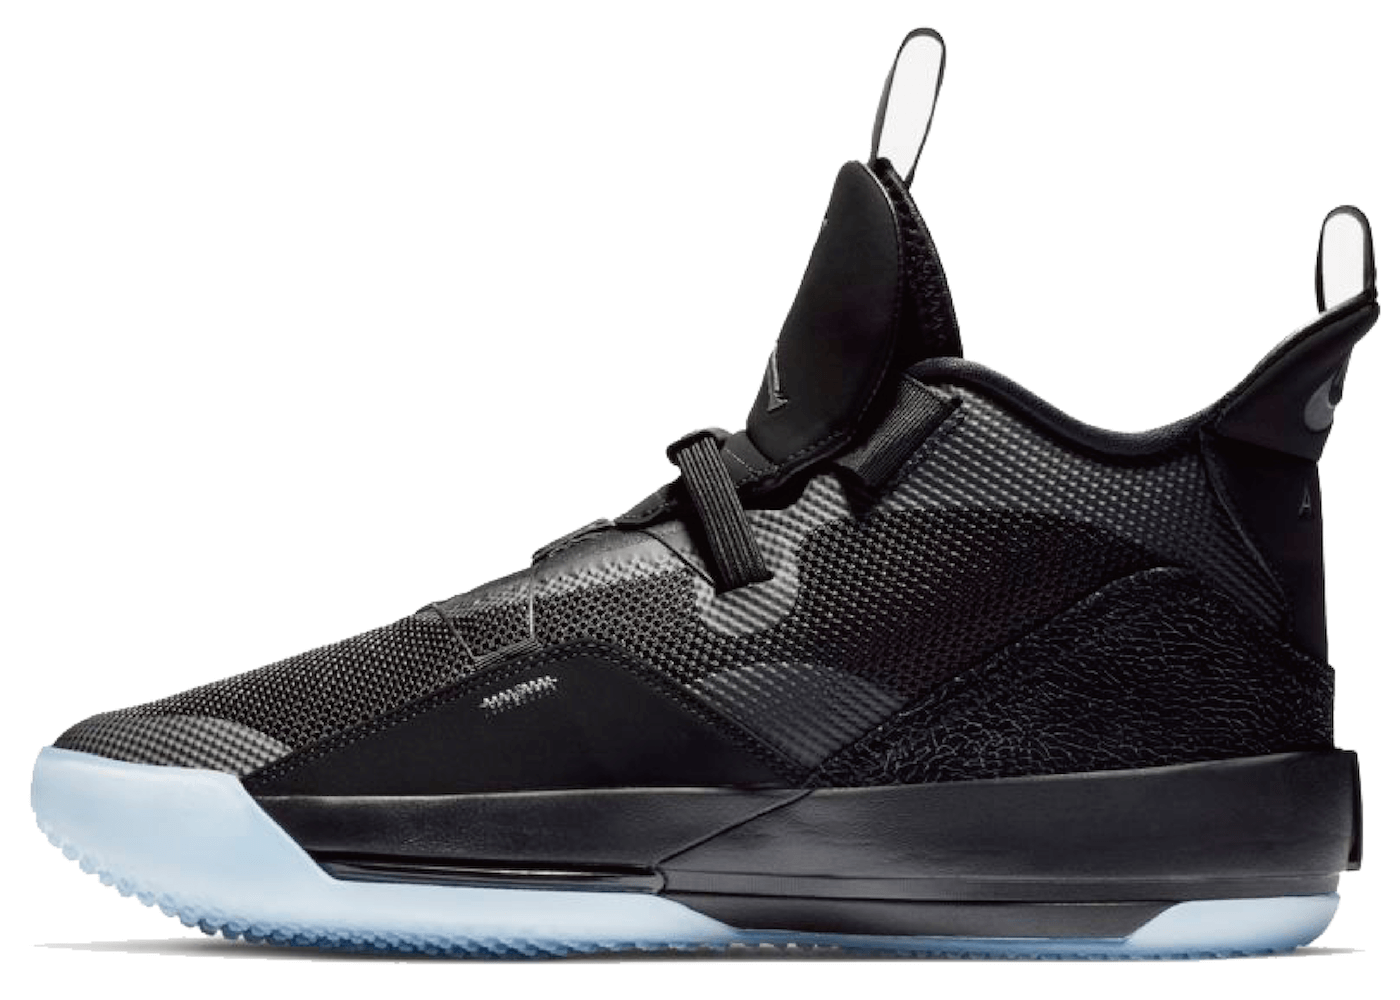 Nike Air Jordan 33 Blackout